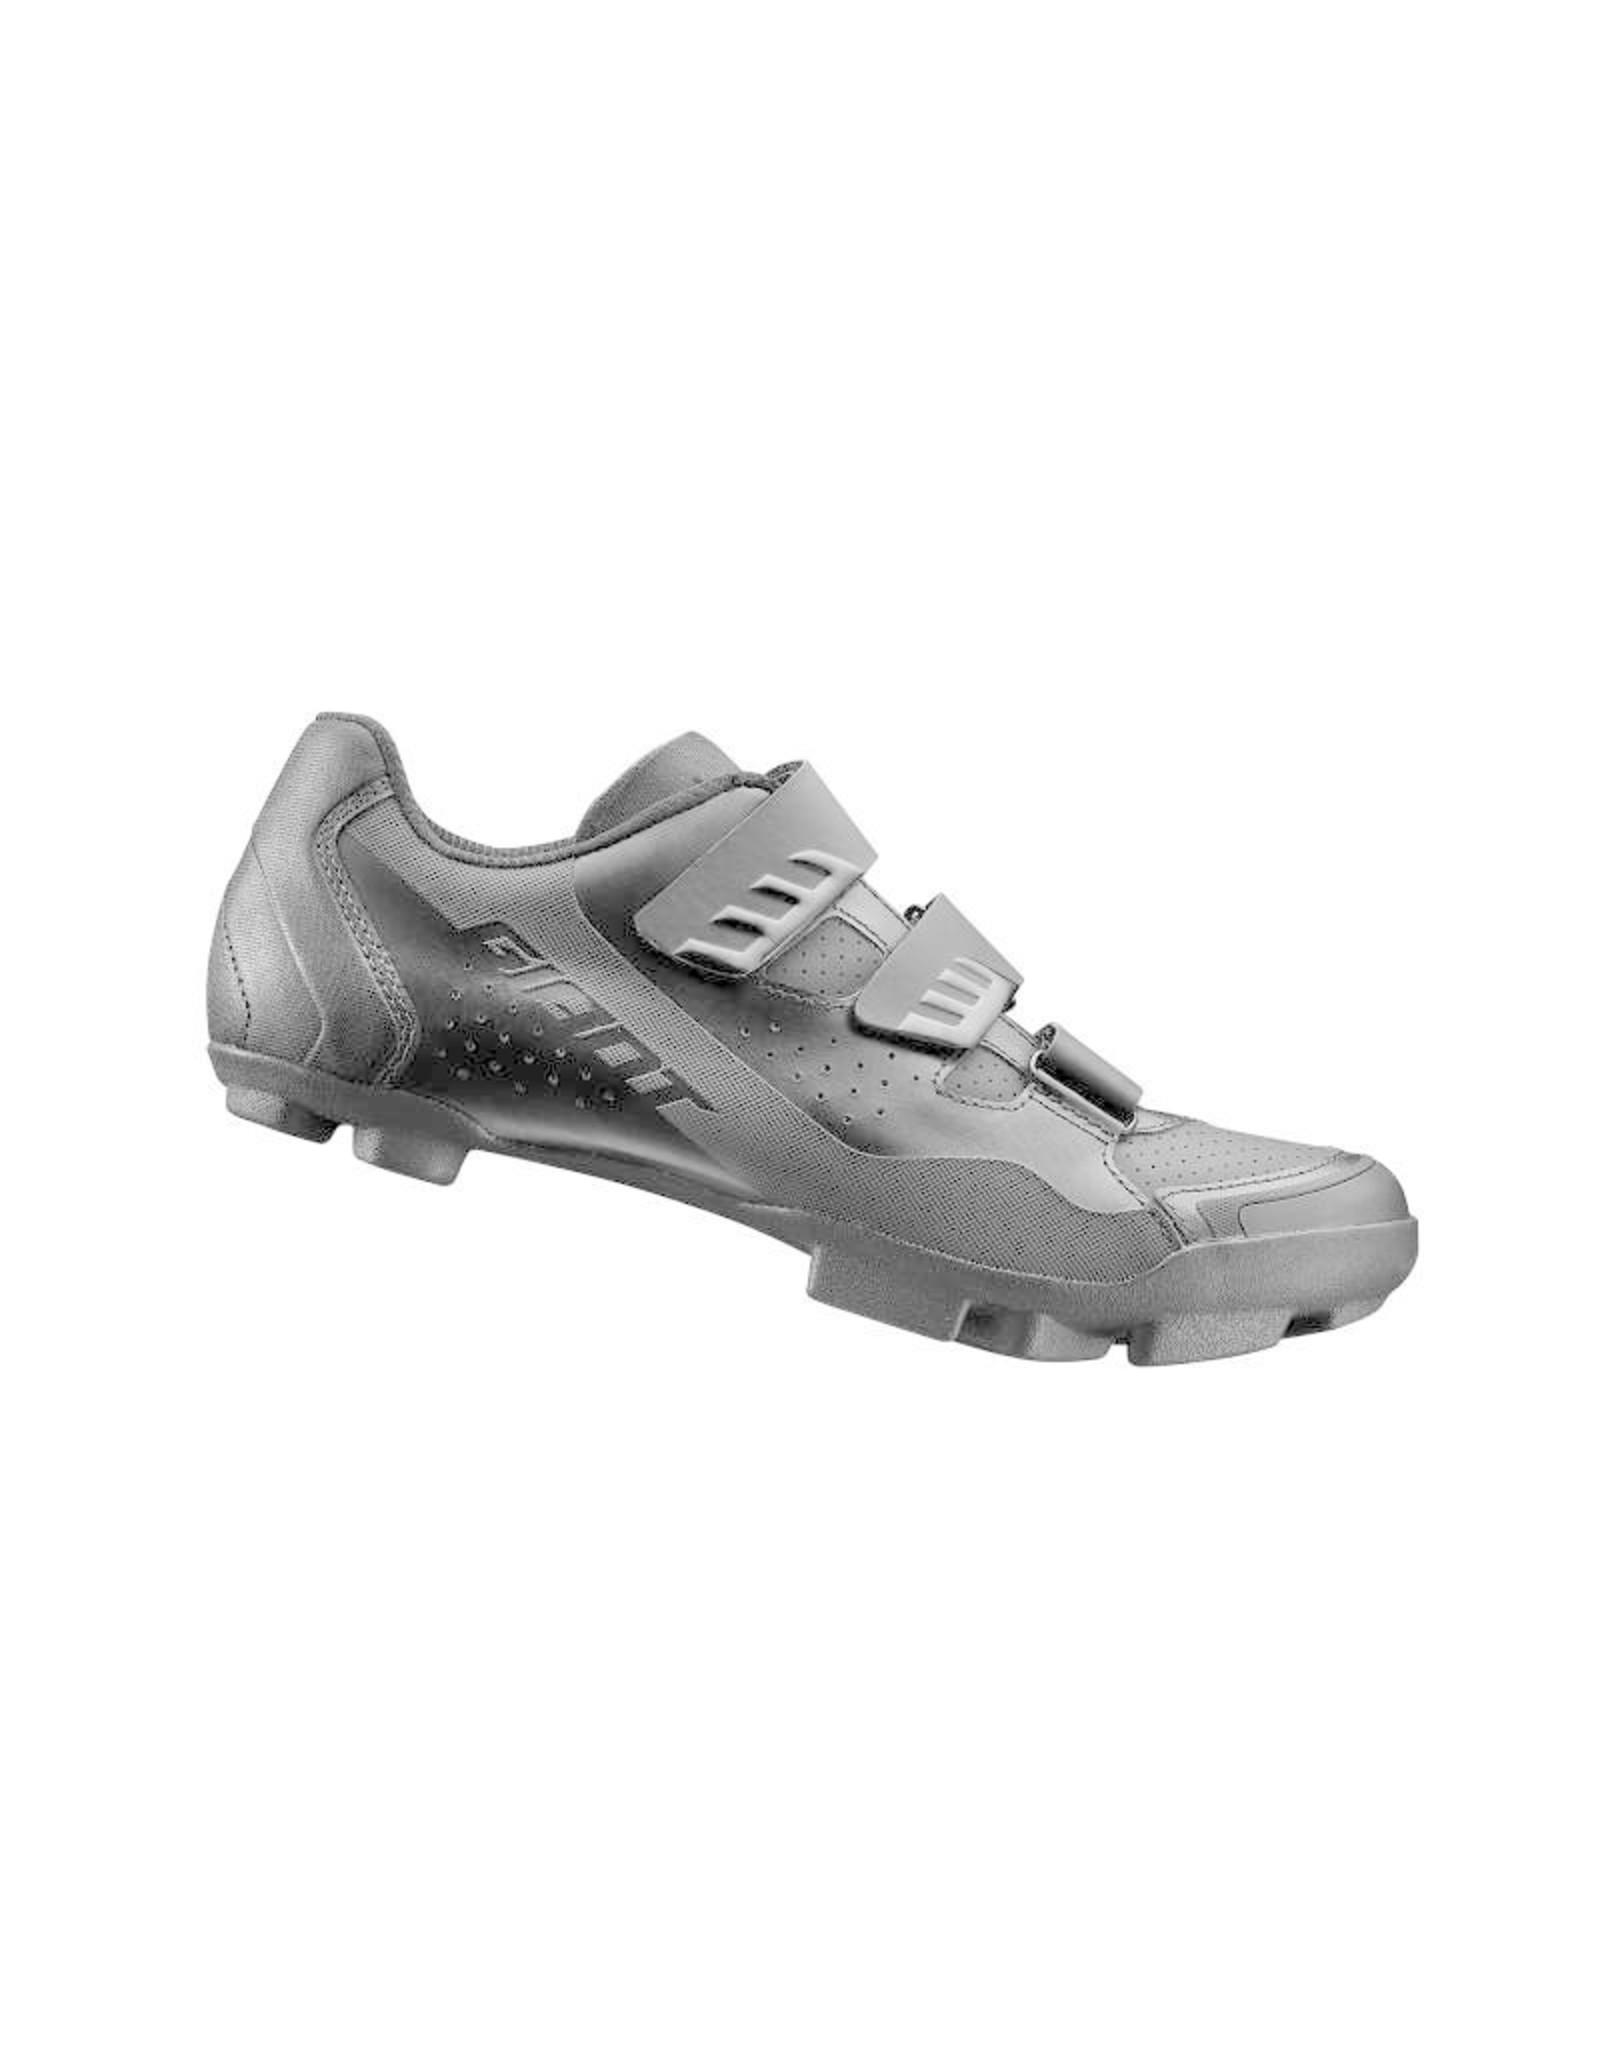 GIANT BICYCLES FLUX Shoe Black/Grey 44 (Reg $129)